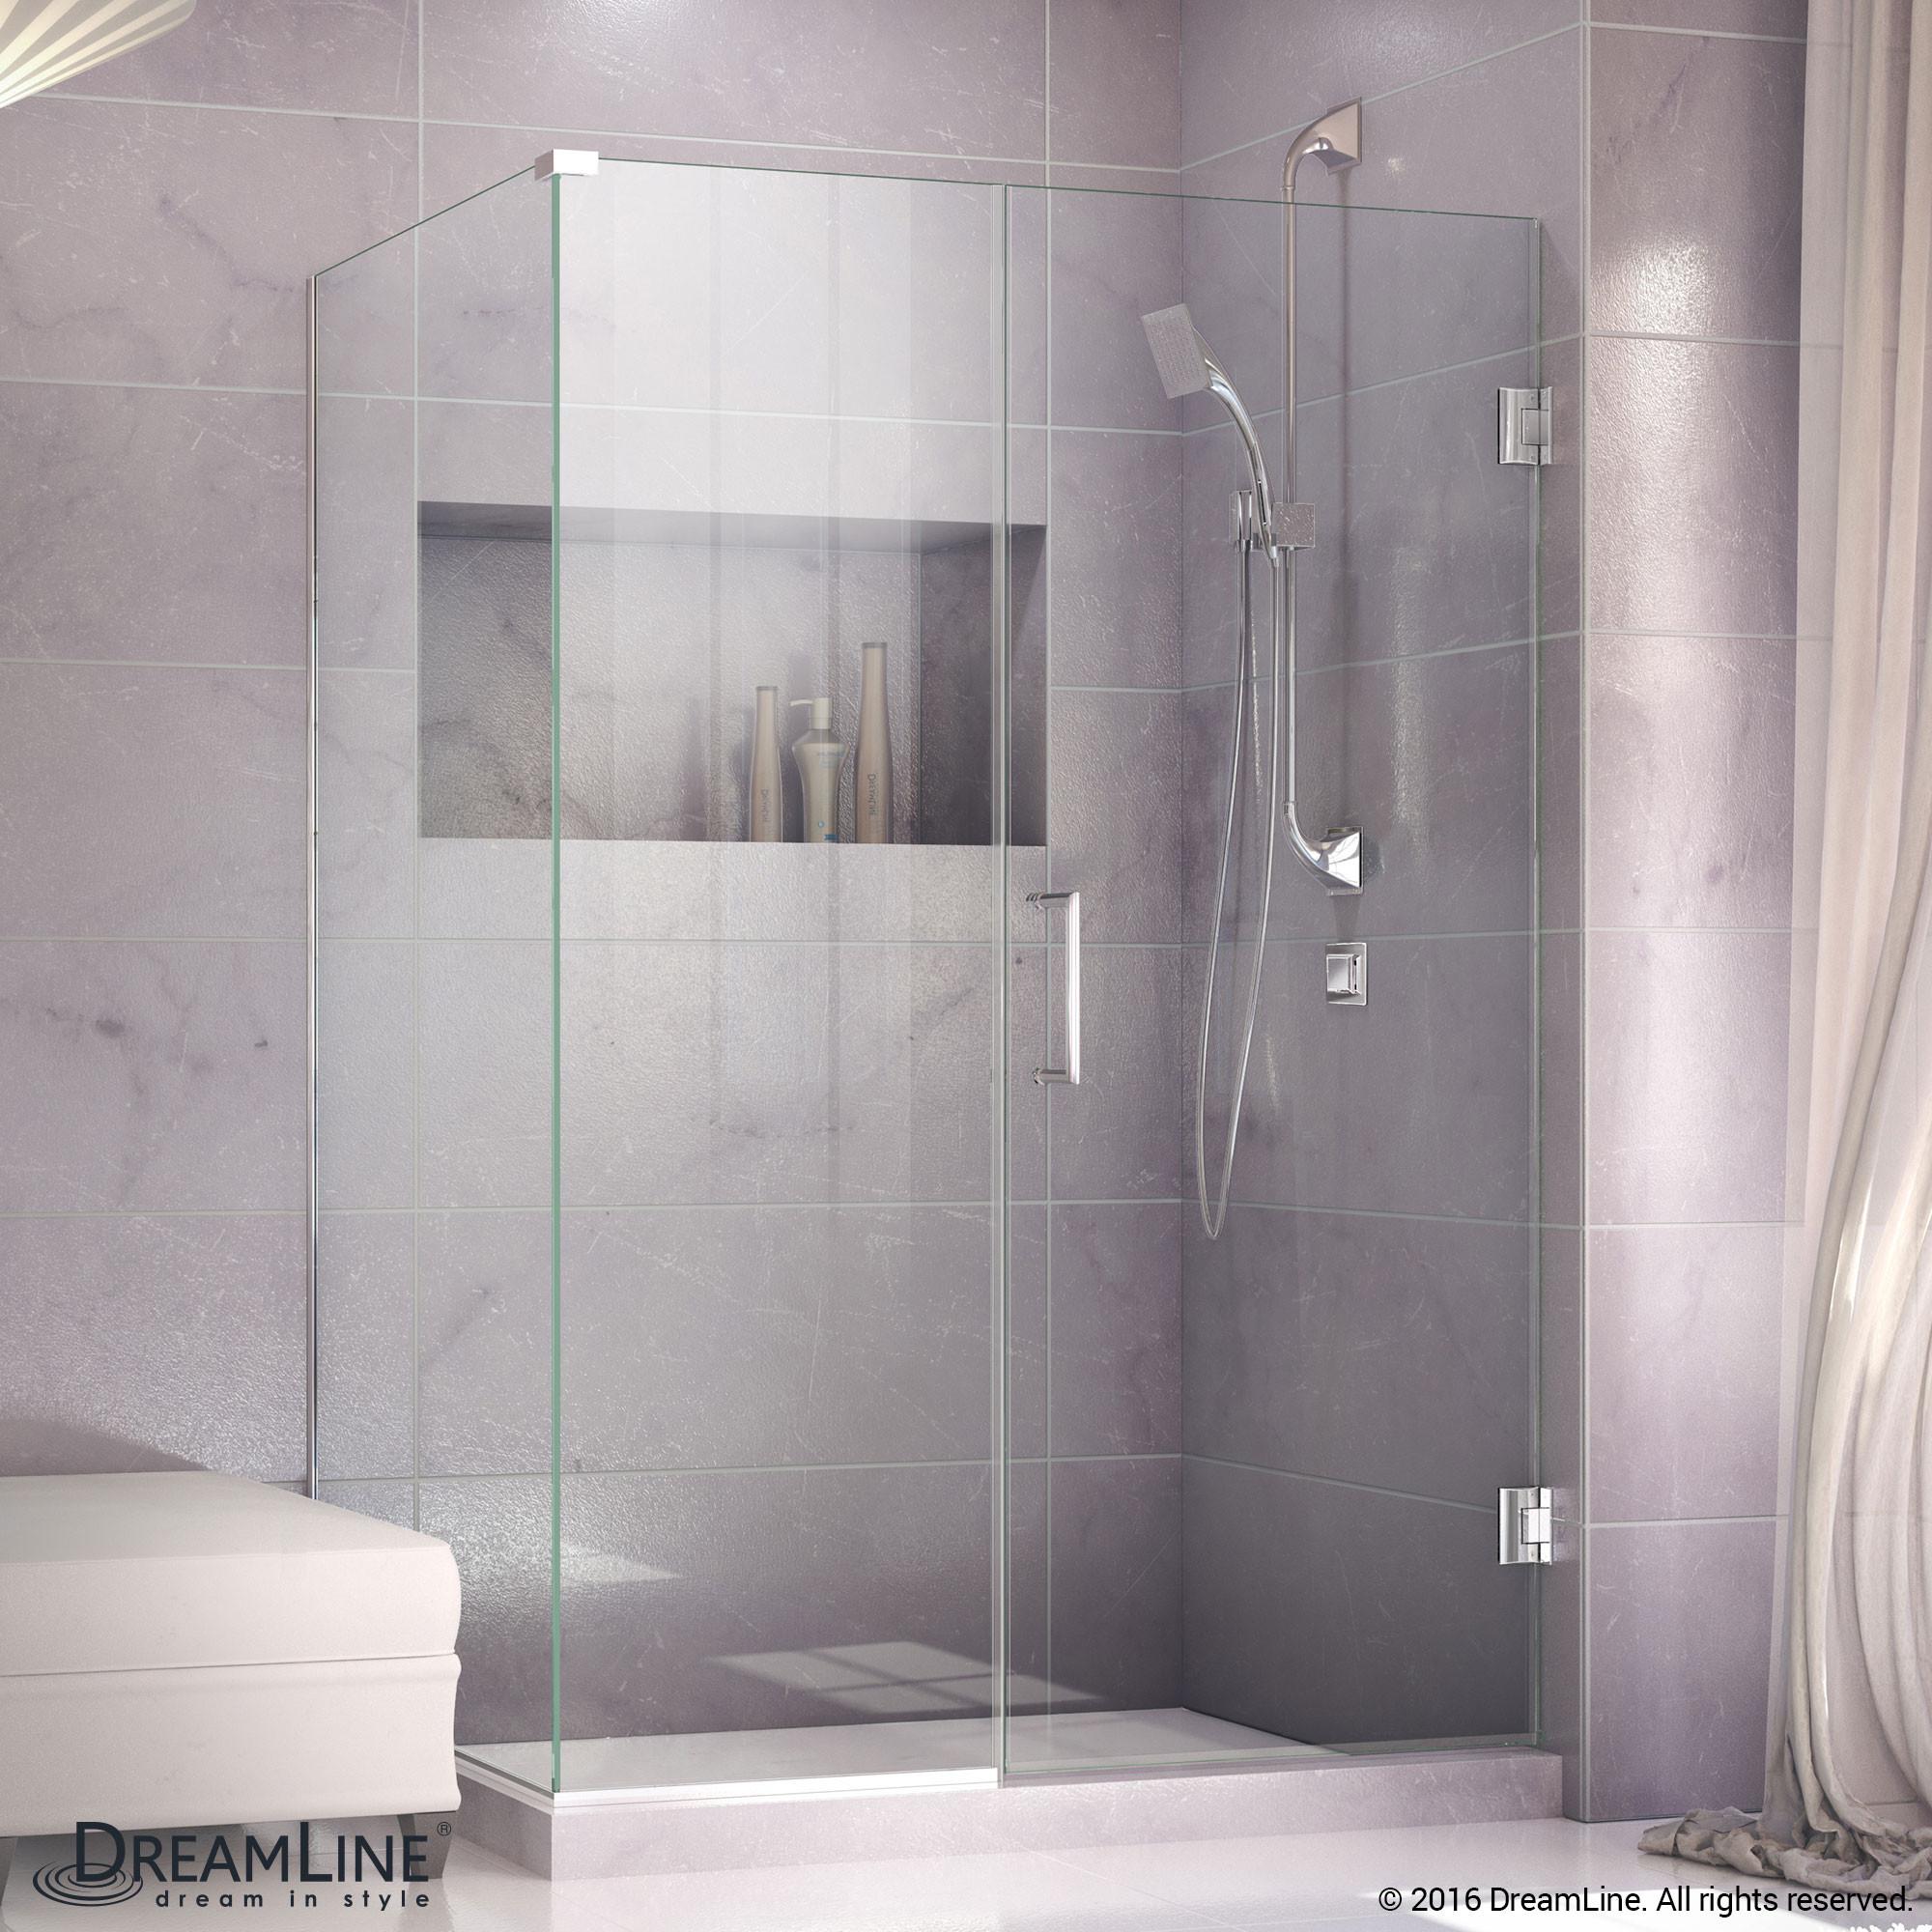 DreamLine SHEN-24425340-01 Unidoor Plus Hinged Shower Enclosure In Chrome Finish Hardware